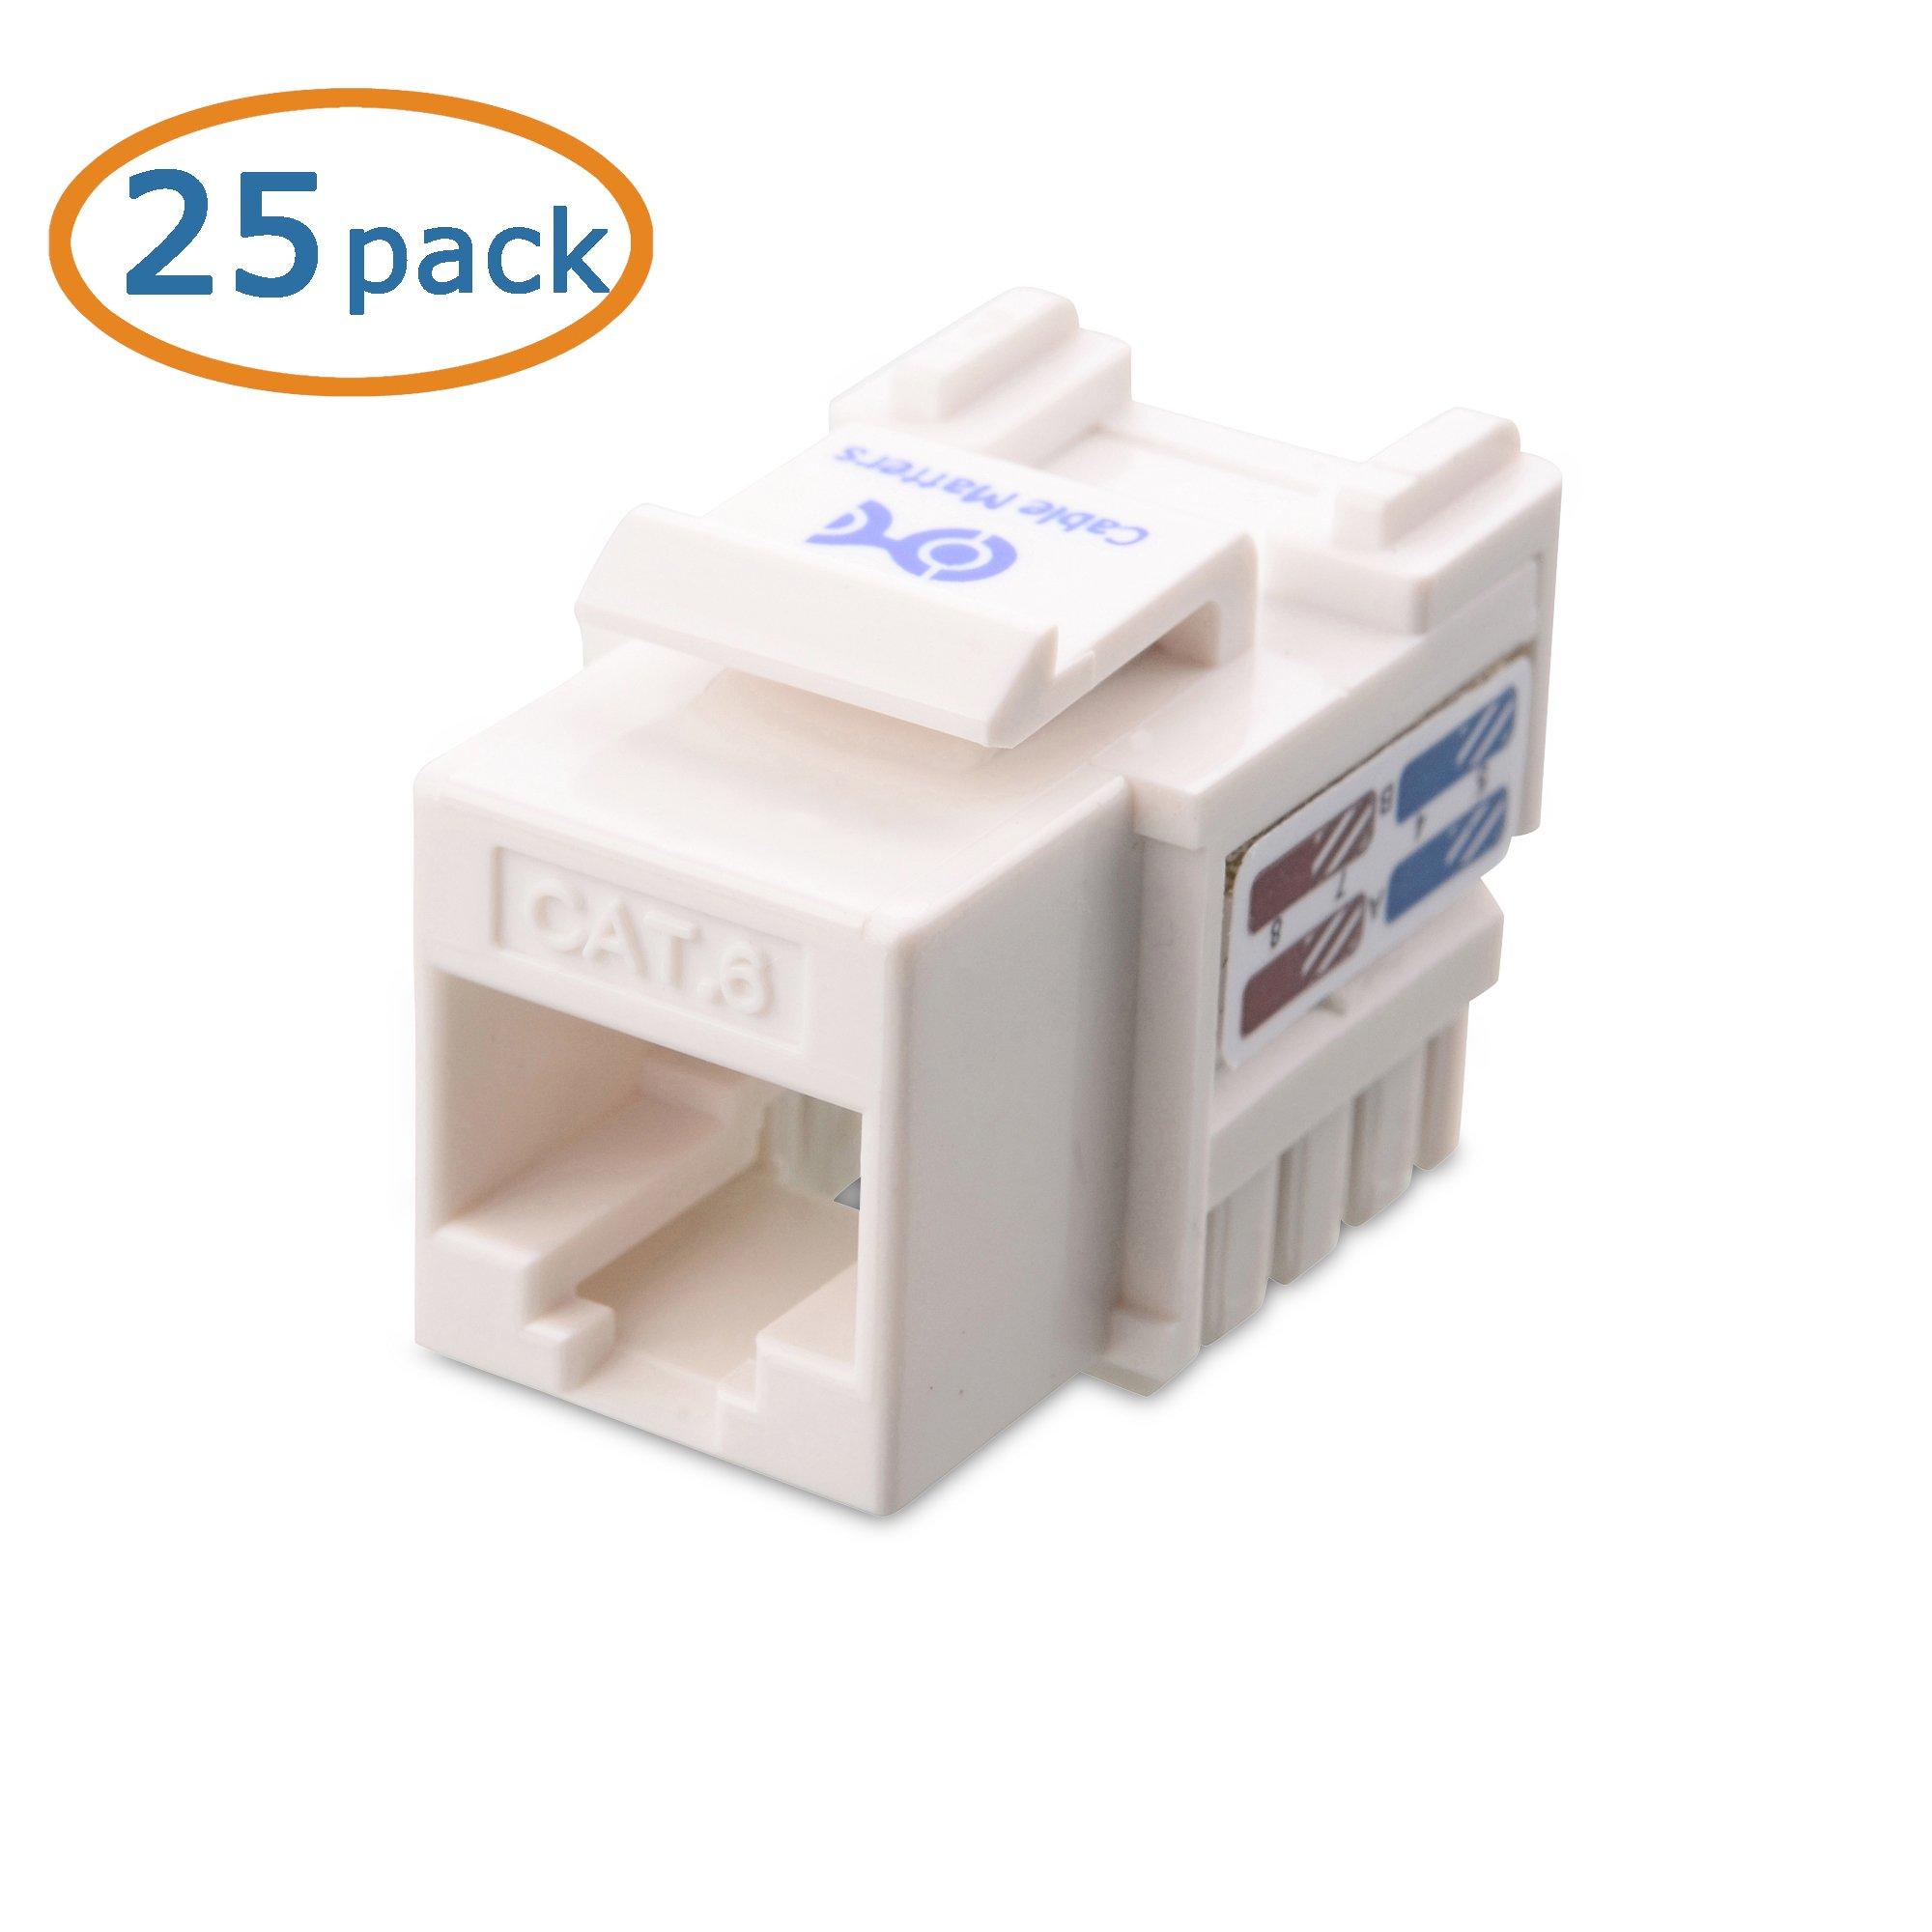 ul listed cable matters 25 pack cat6 rj45 keystone jack. Black Bedroom Furniture Sets. Home Design Ideas